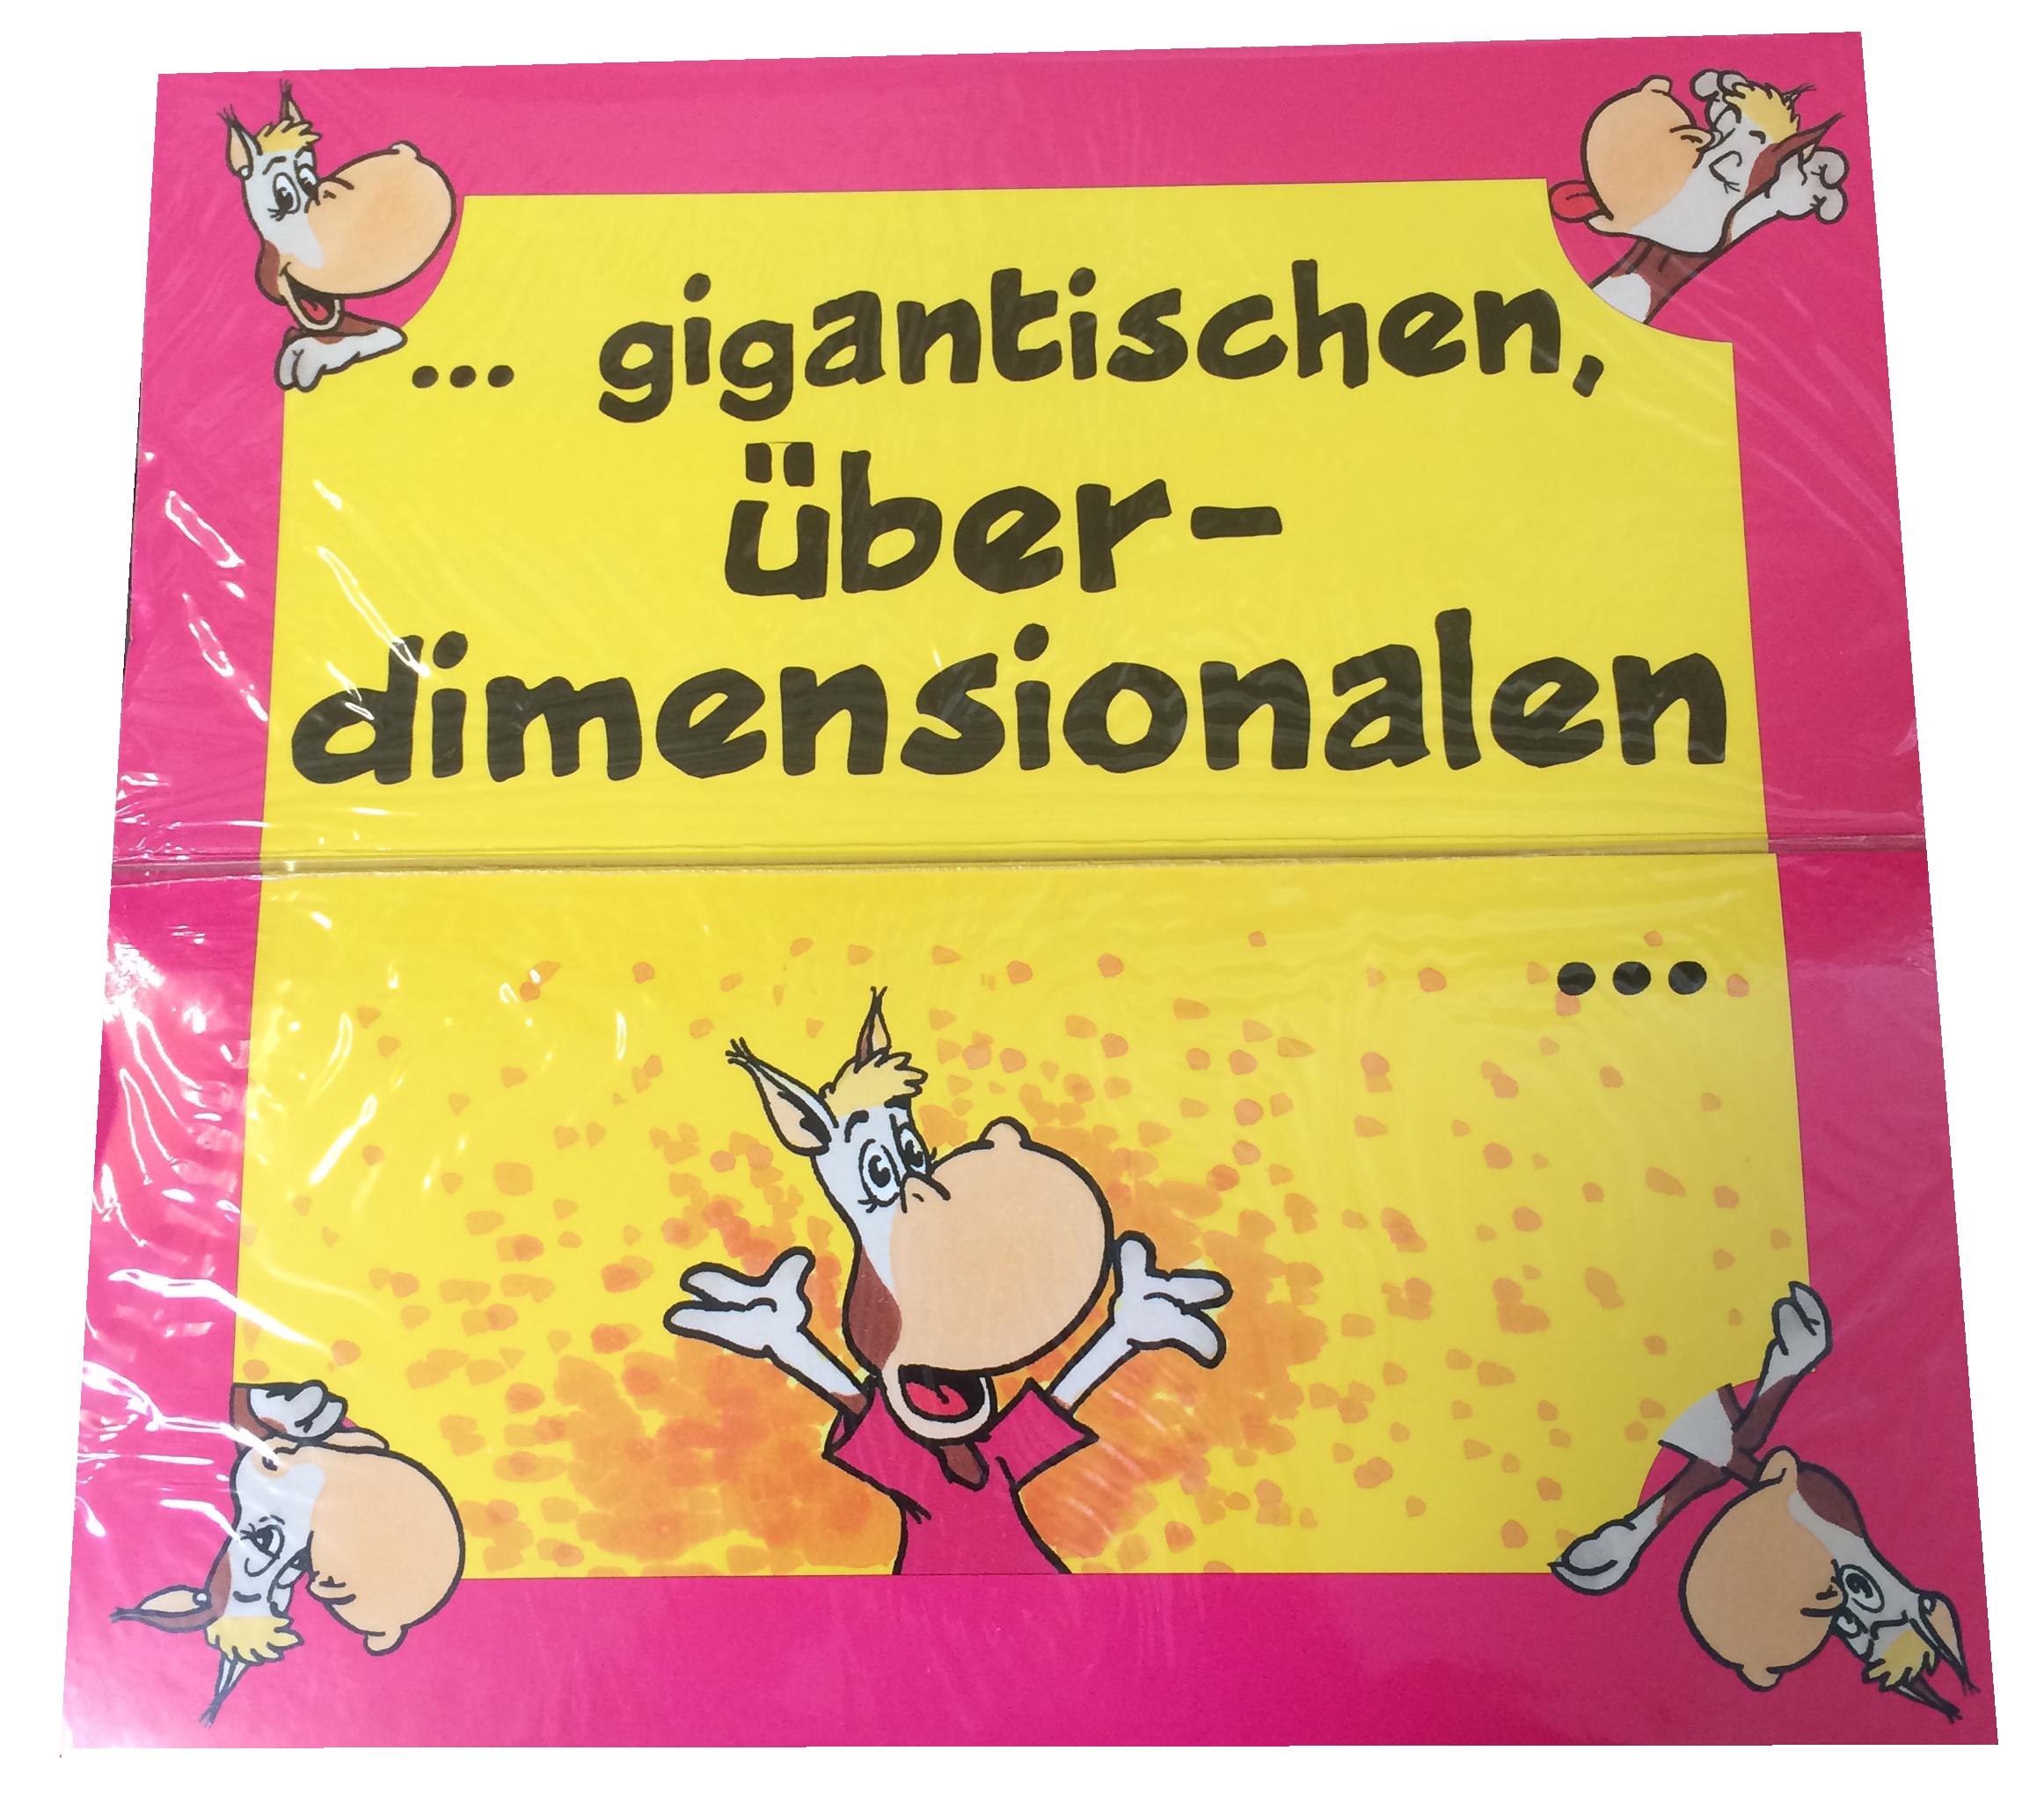 Riesen Glückwunsch Geburtstagskarte   carina geschenke.ch